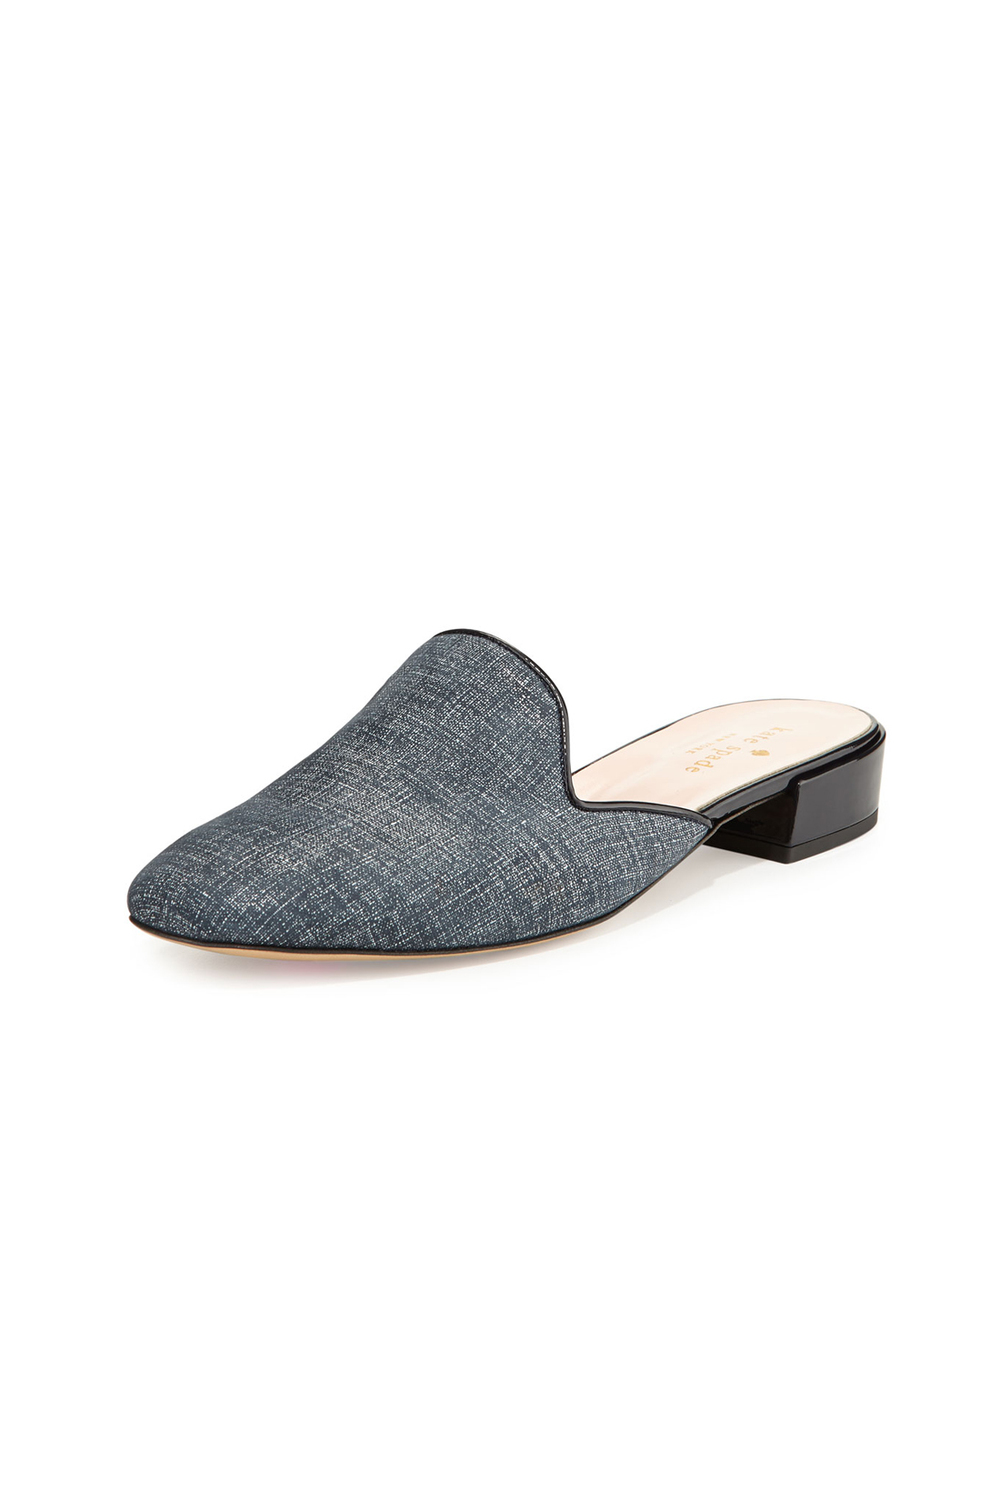 07-spring-denim-trends-shoes-03.jpg